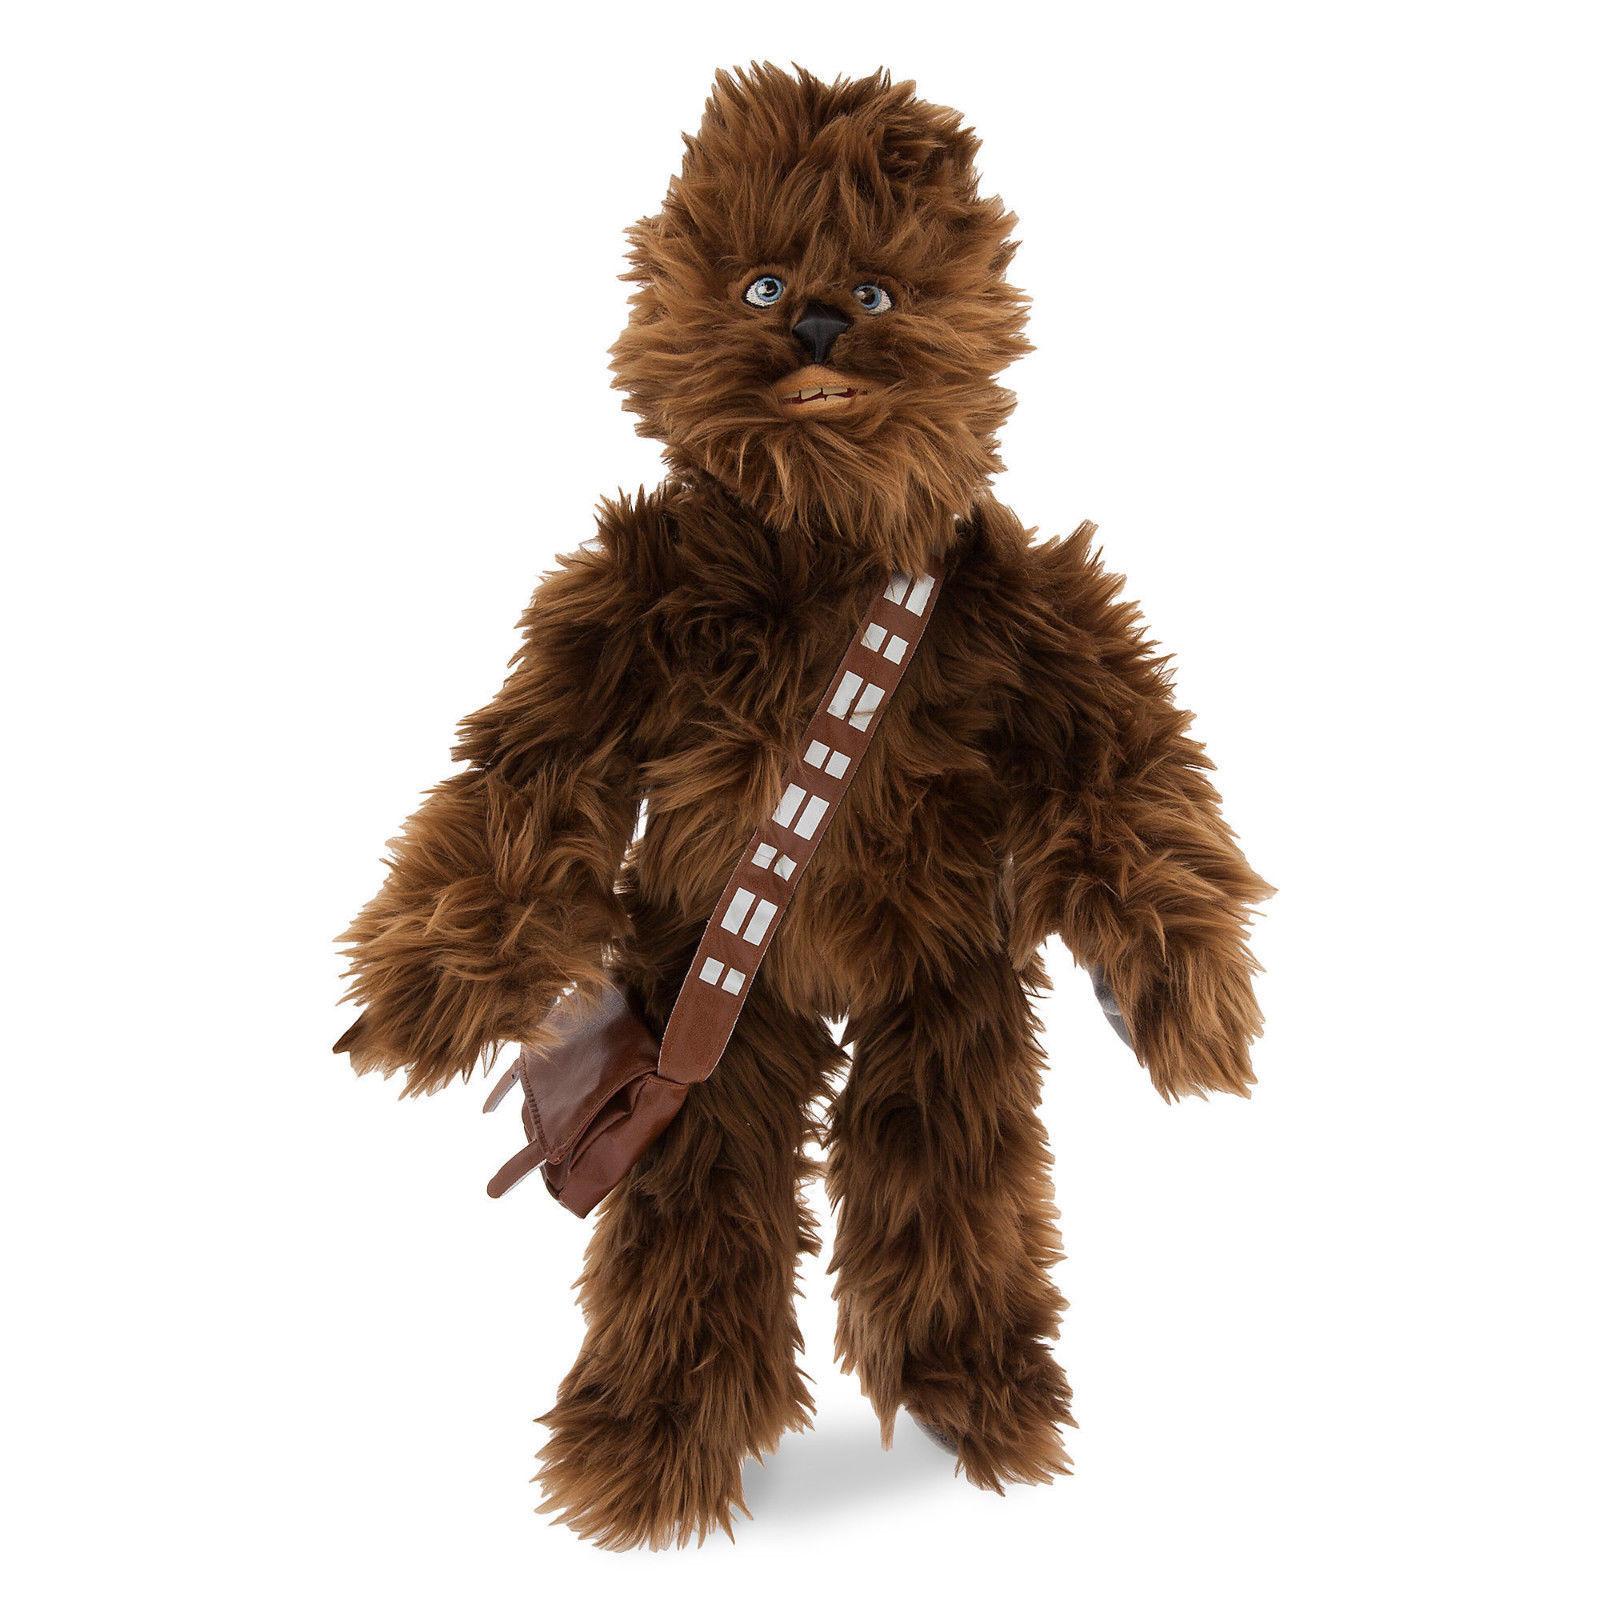 Disney Store Star Wars Chewbacca Plush Large 19''